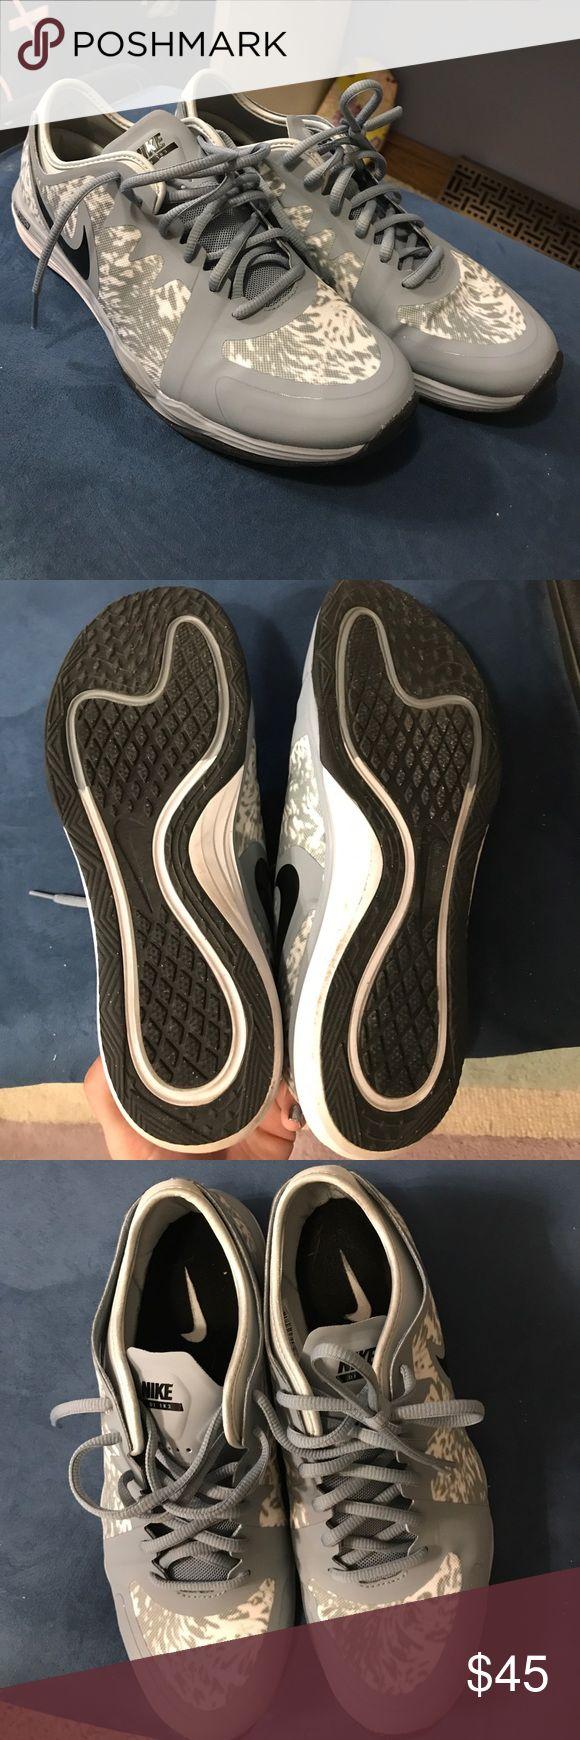 NIKE Dual Fusion Worn once Nike Dual Fusion  cheetah print. Nike Shoes Athletic Shoes